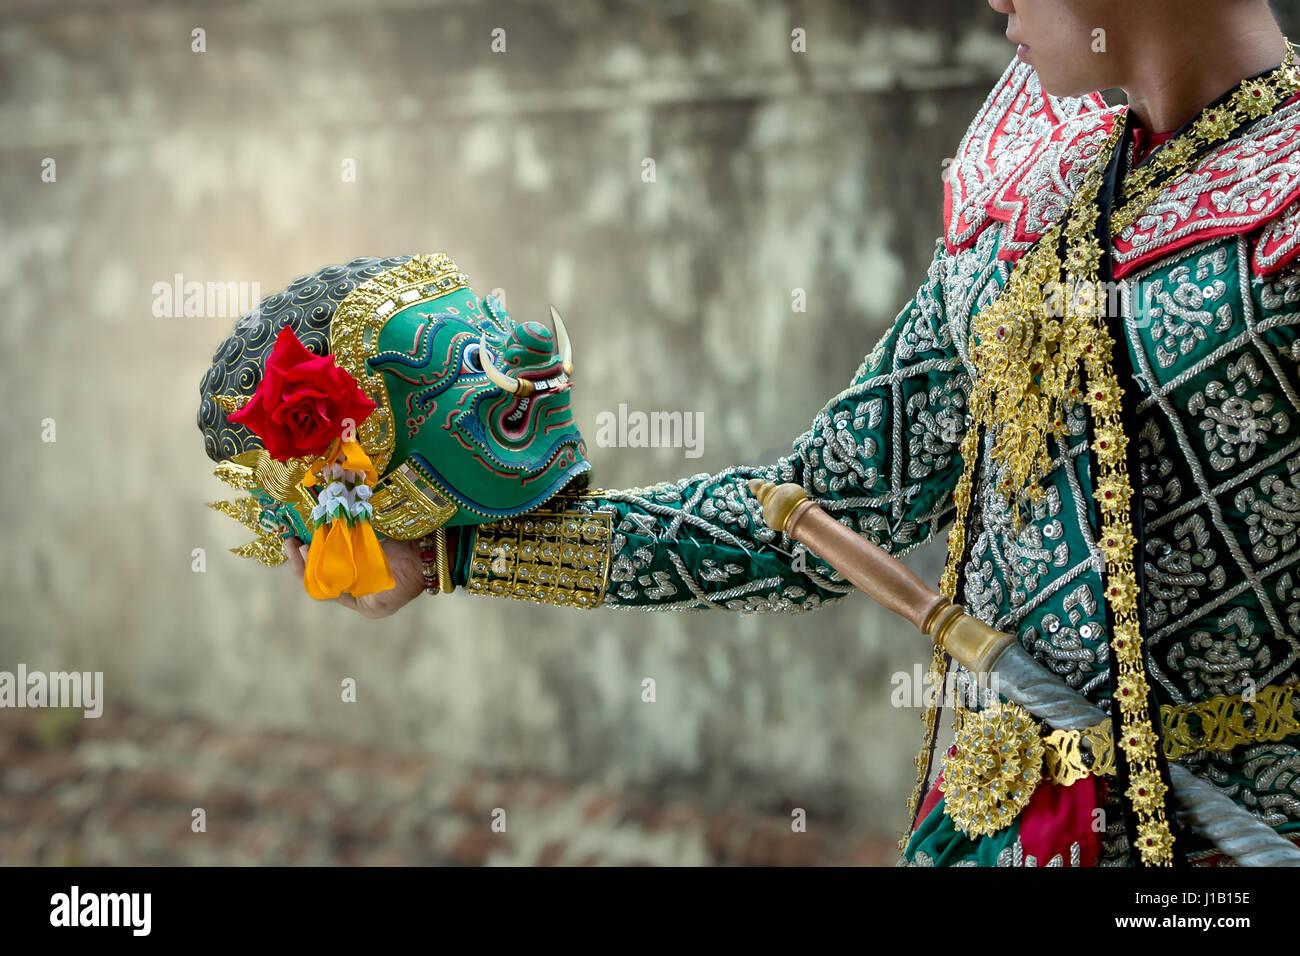 Kumbhakarna et Hanuman Art culture danse masquée en Thaïlande khon en littérature Ramayana de l'Asie. Photo Stock